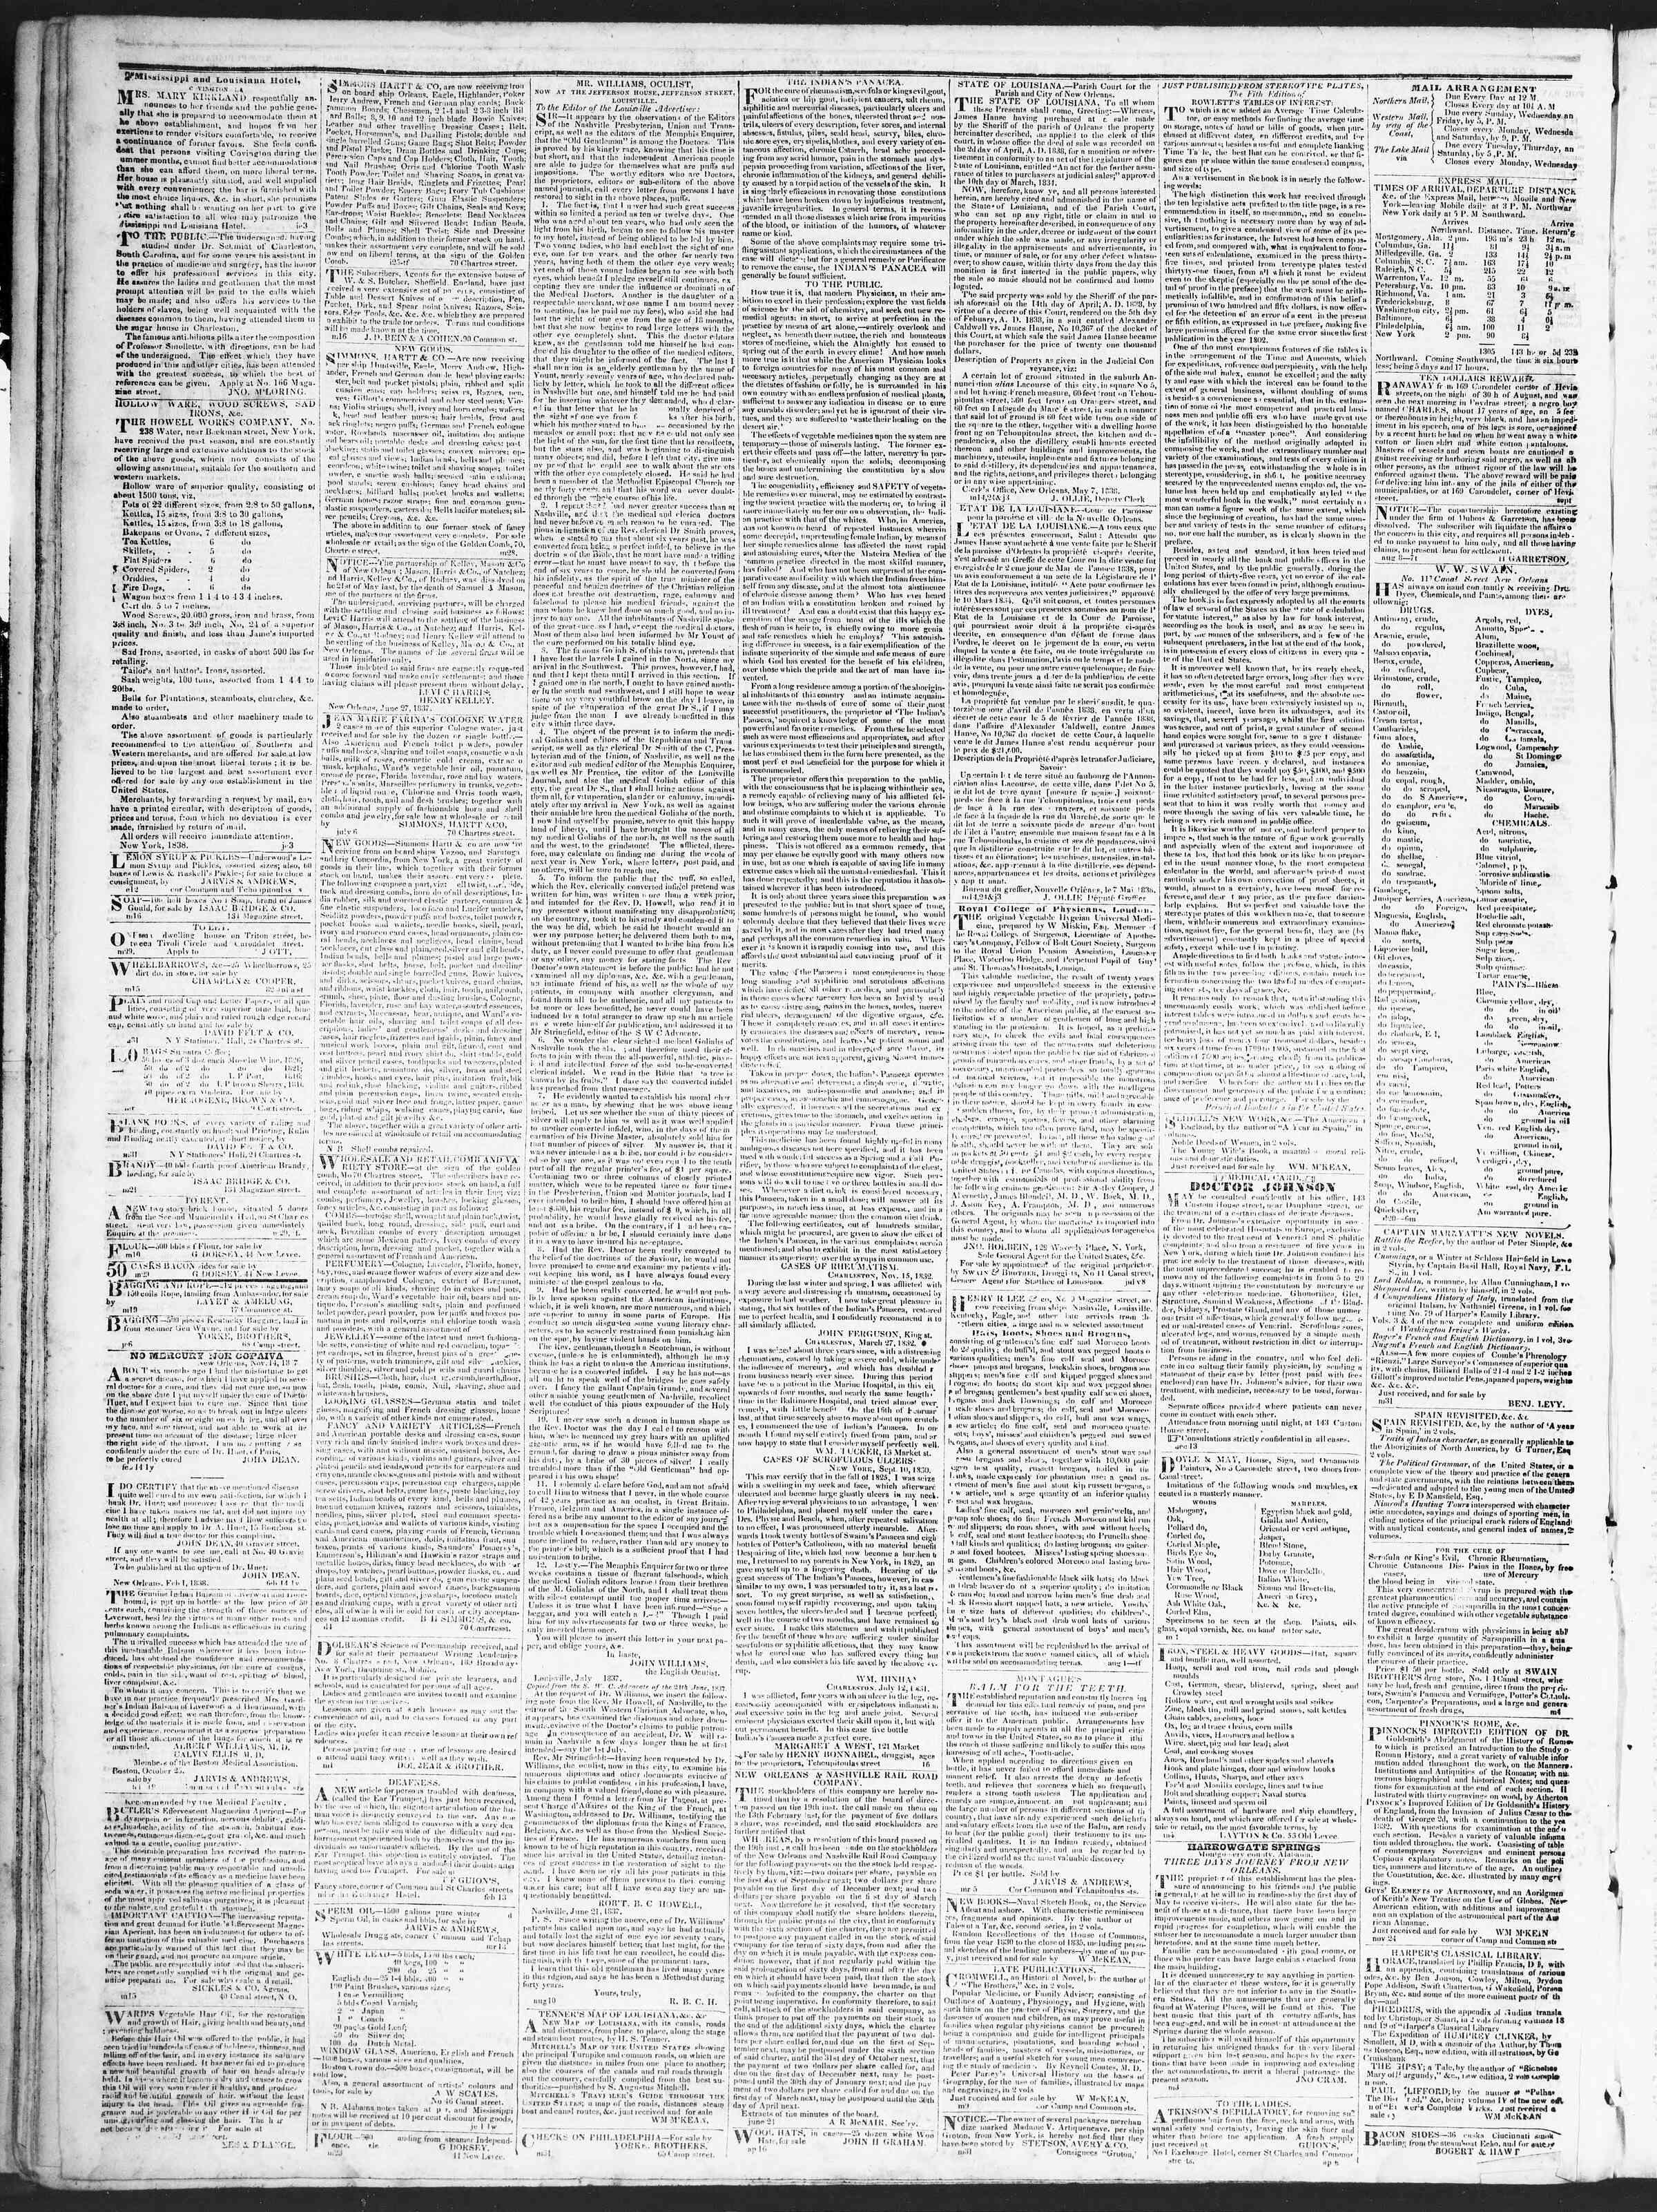 August 16, 1838 Tarihli True American Gazetesi Sayfa 4